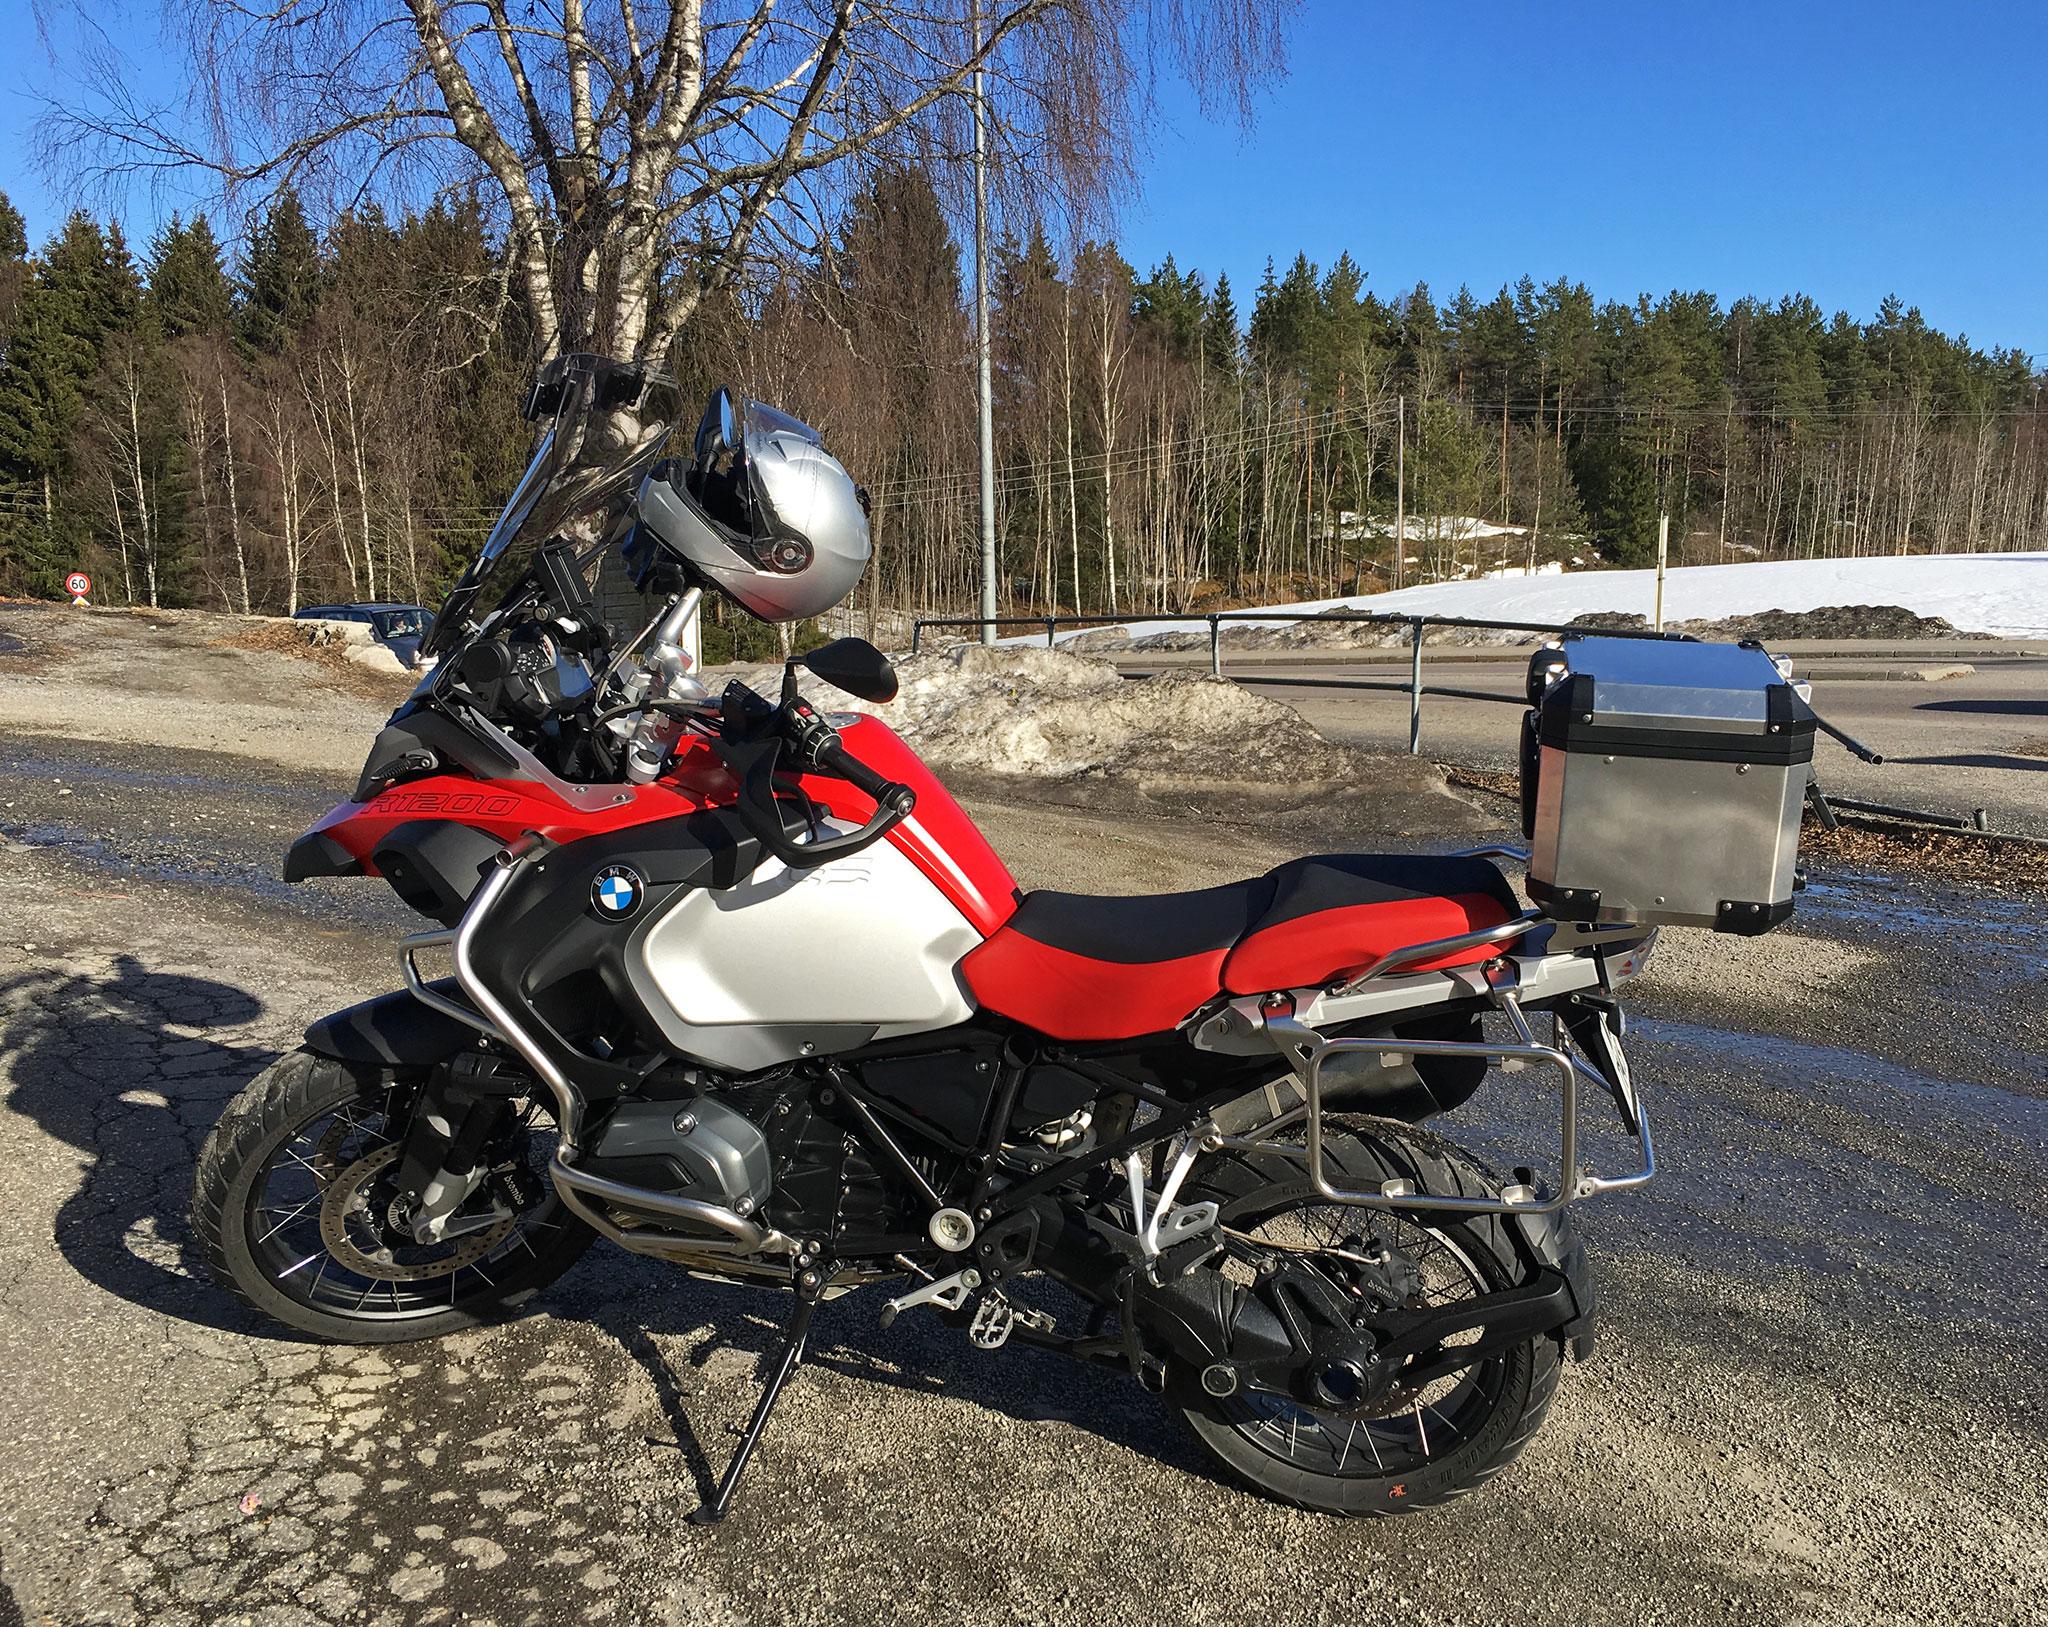 Spring ride: BMW R1200GS Adventure